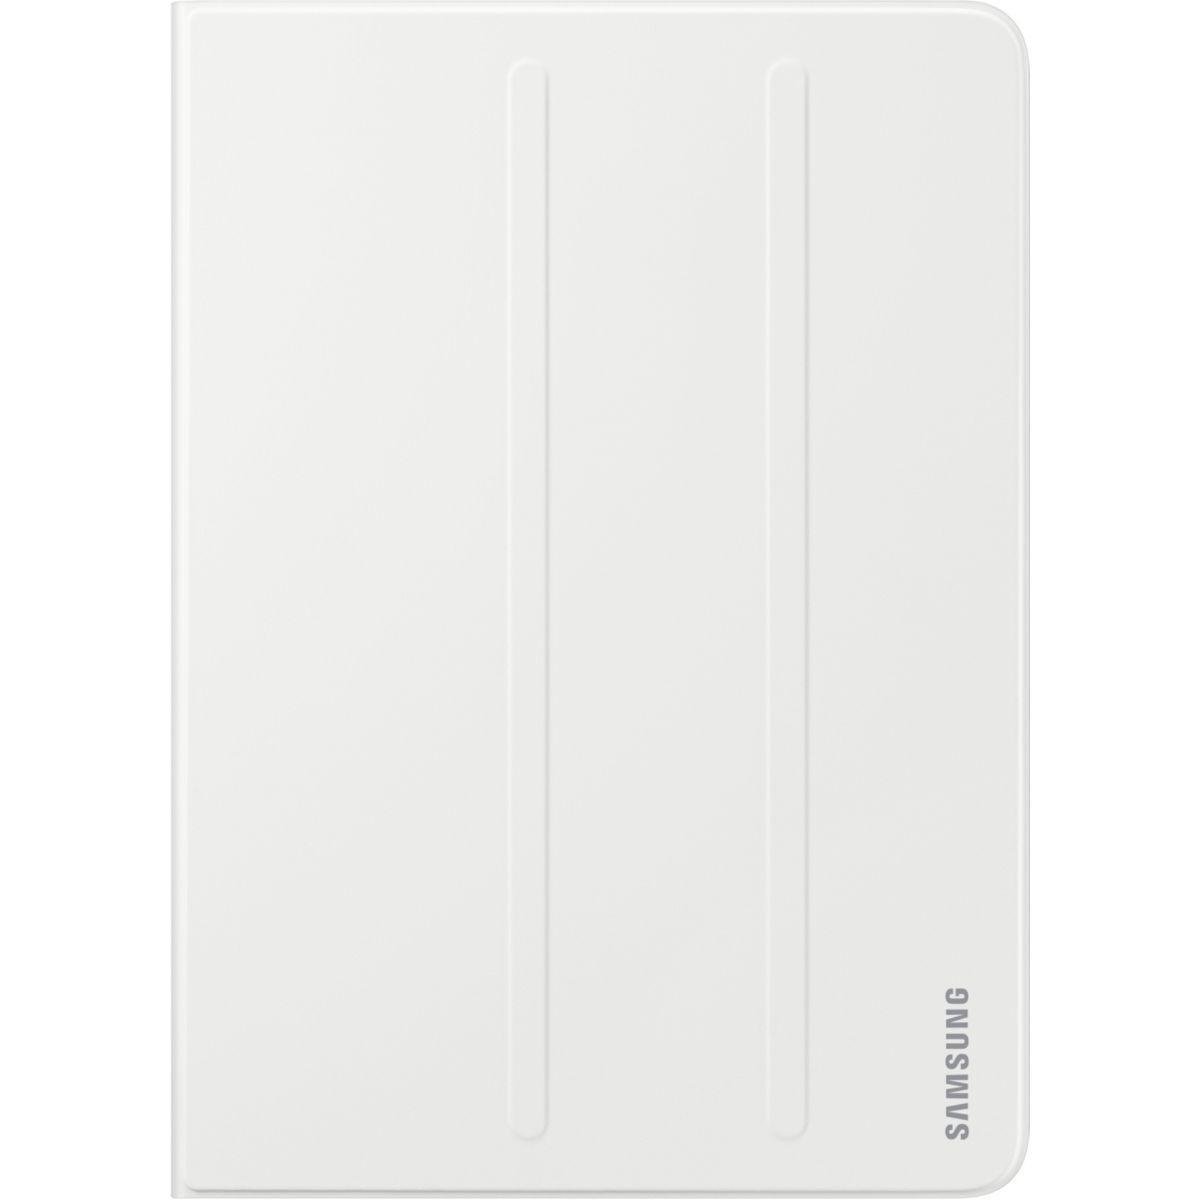 Etui tablette samsung book cover tab s3 blanc - livraison offerte : code liv (photo)